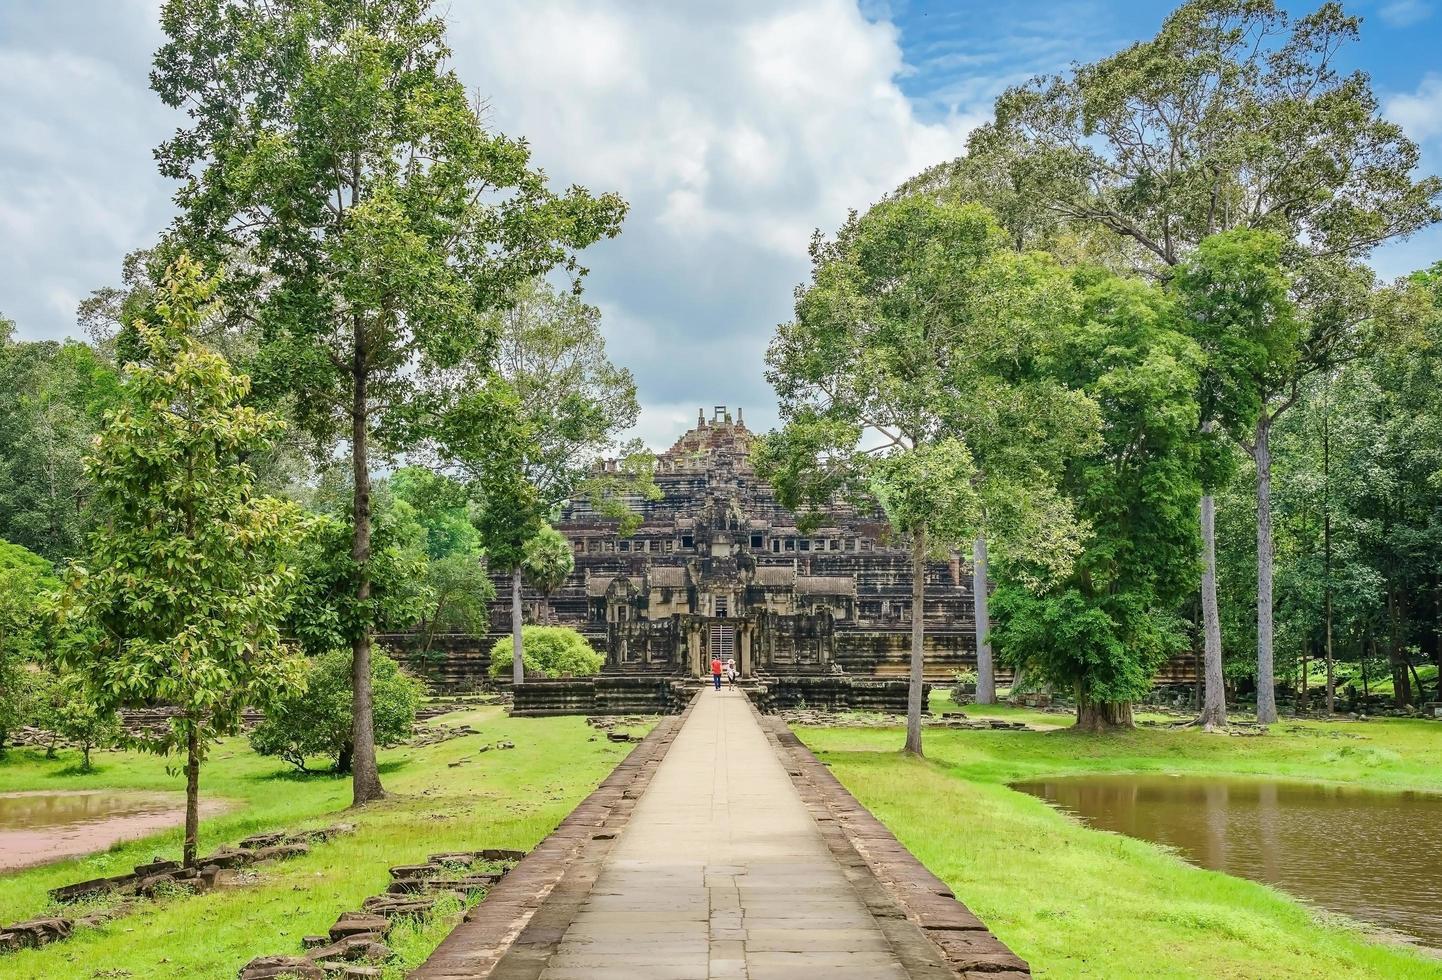 vue sur le temple baphuon, angkor thom, siem reap, cambodge photo